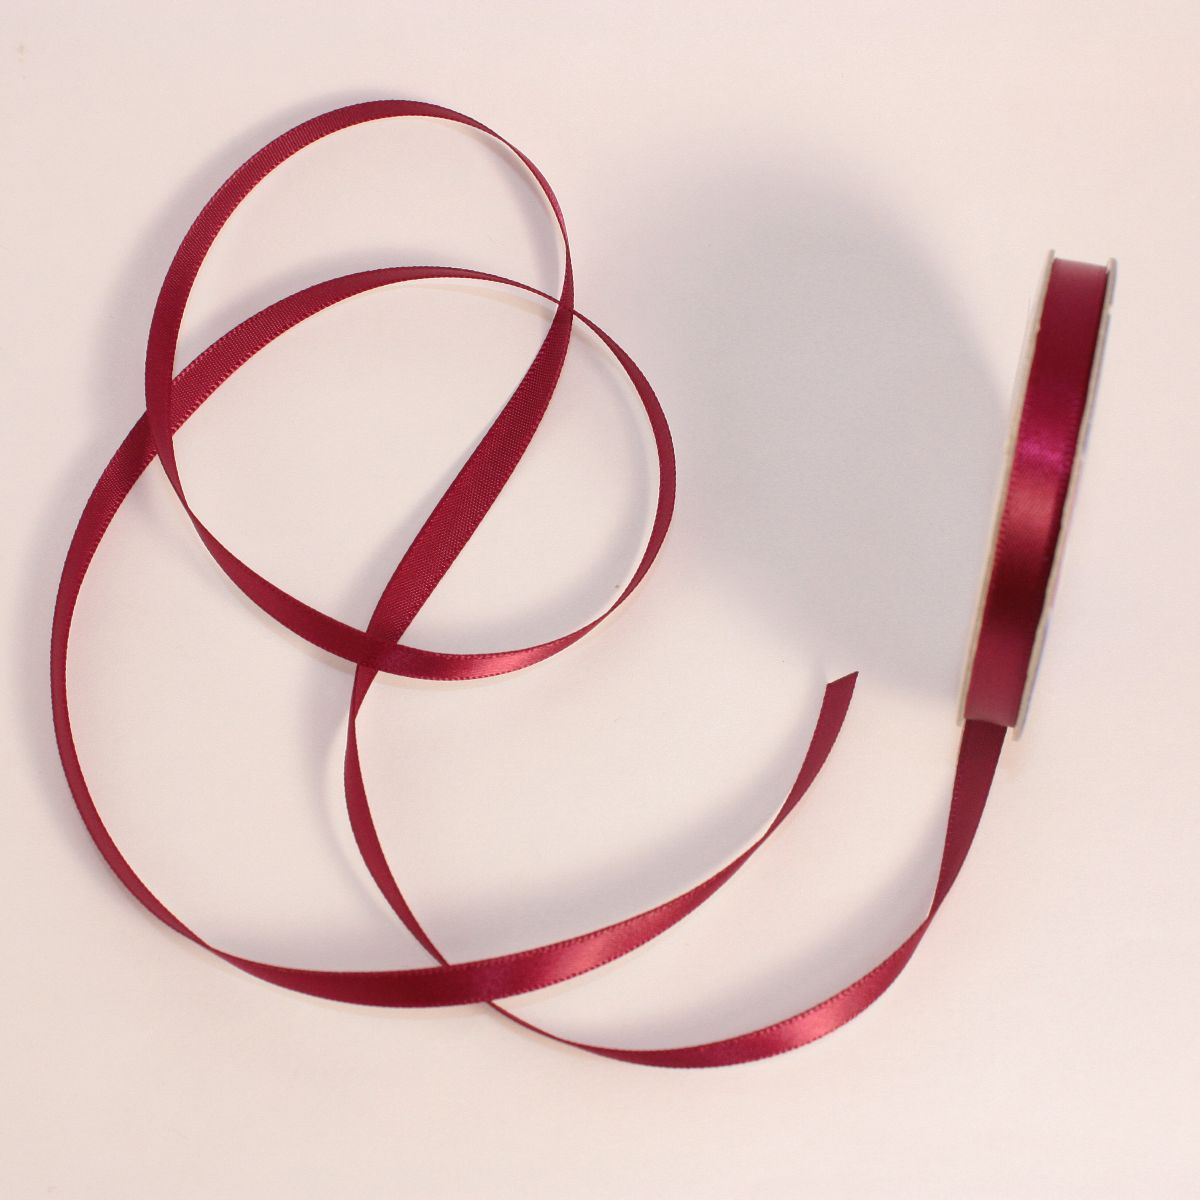 Ruban satin en bobine bordeaux 6 mm